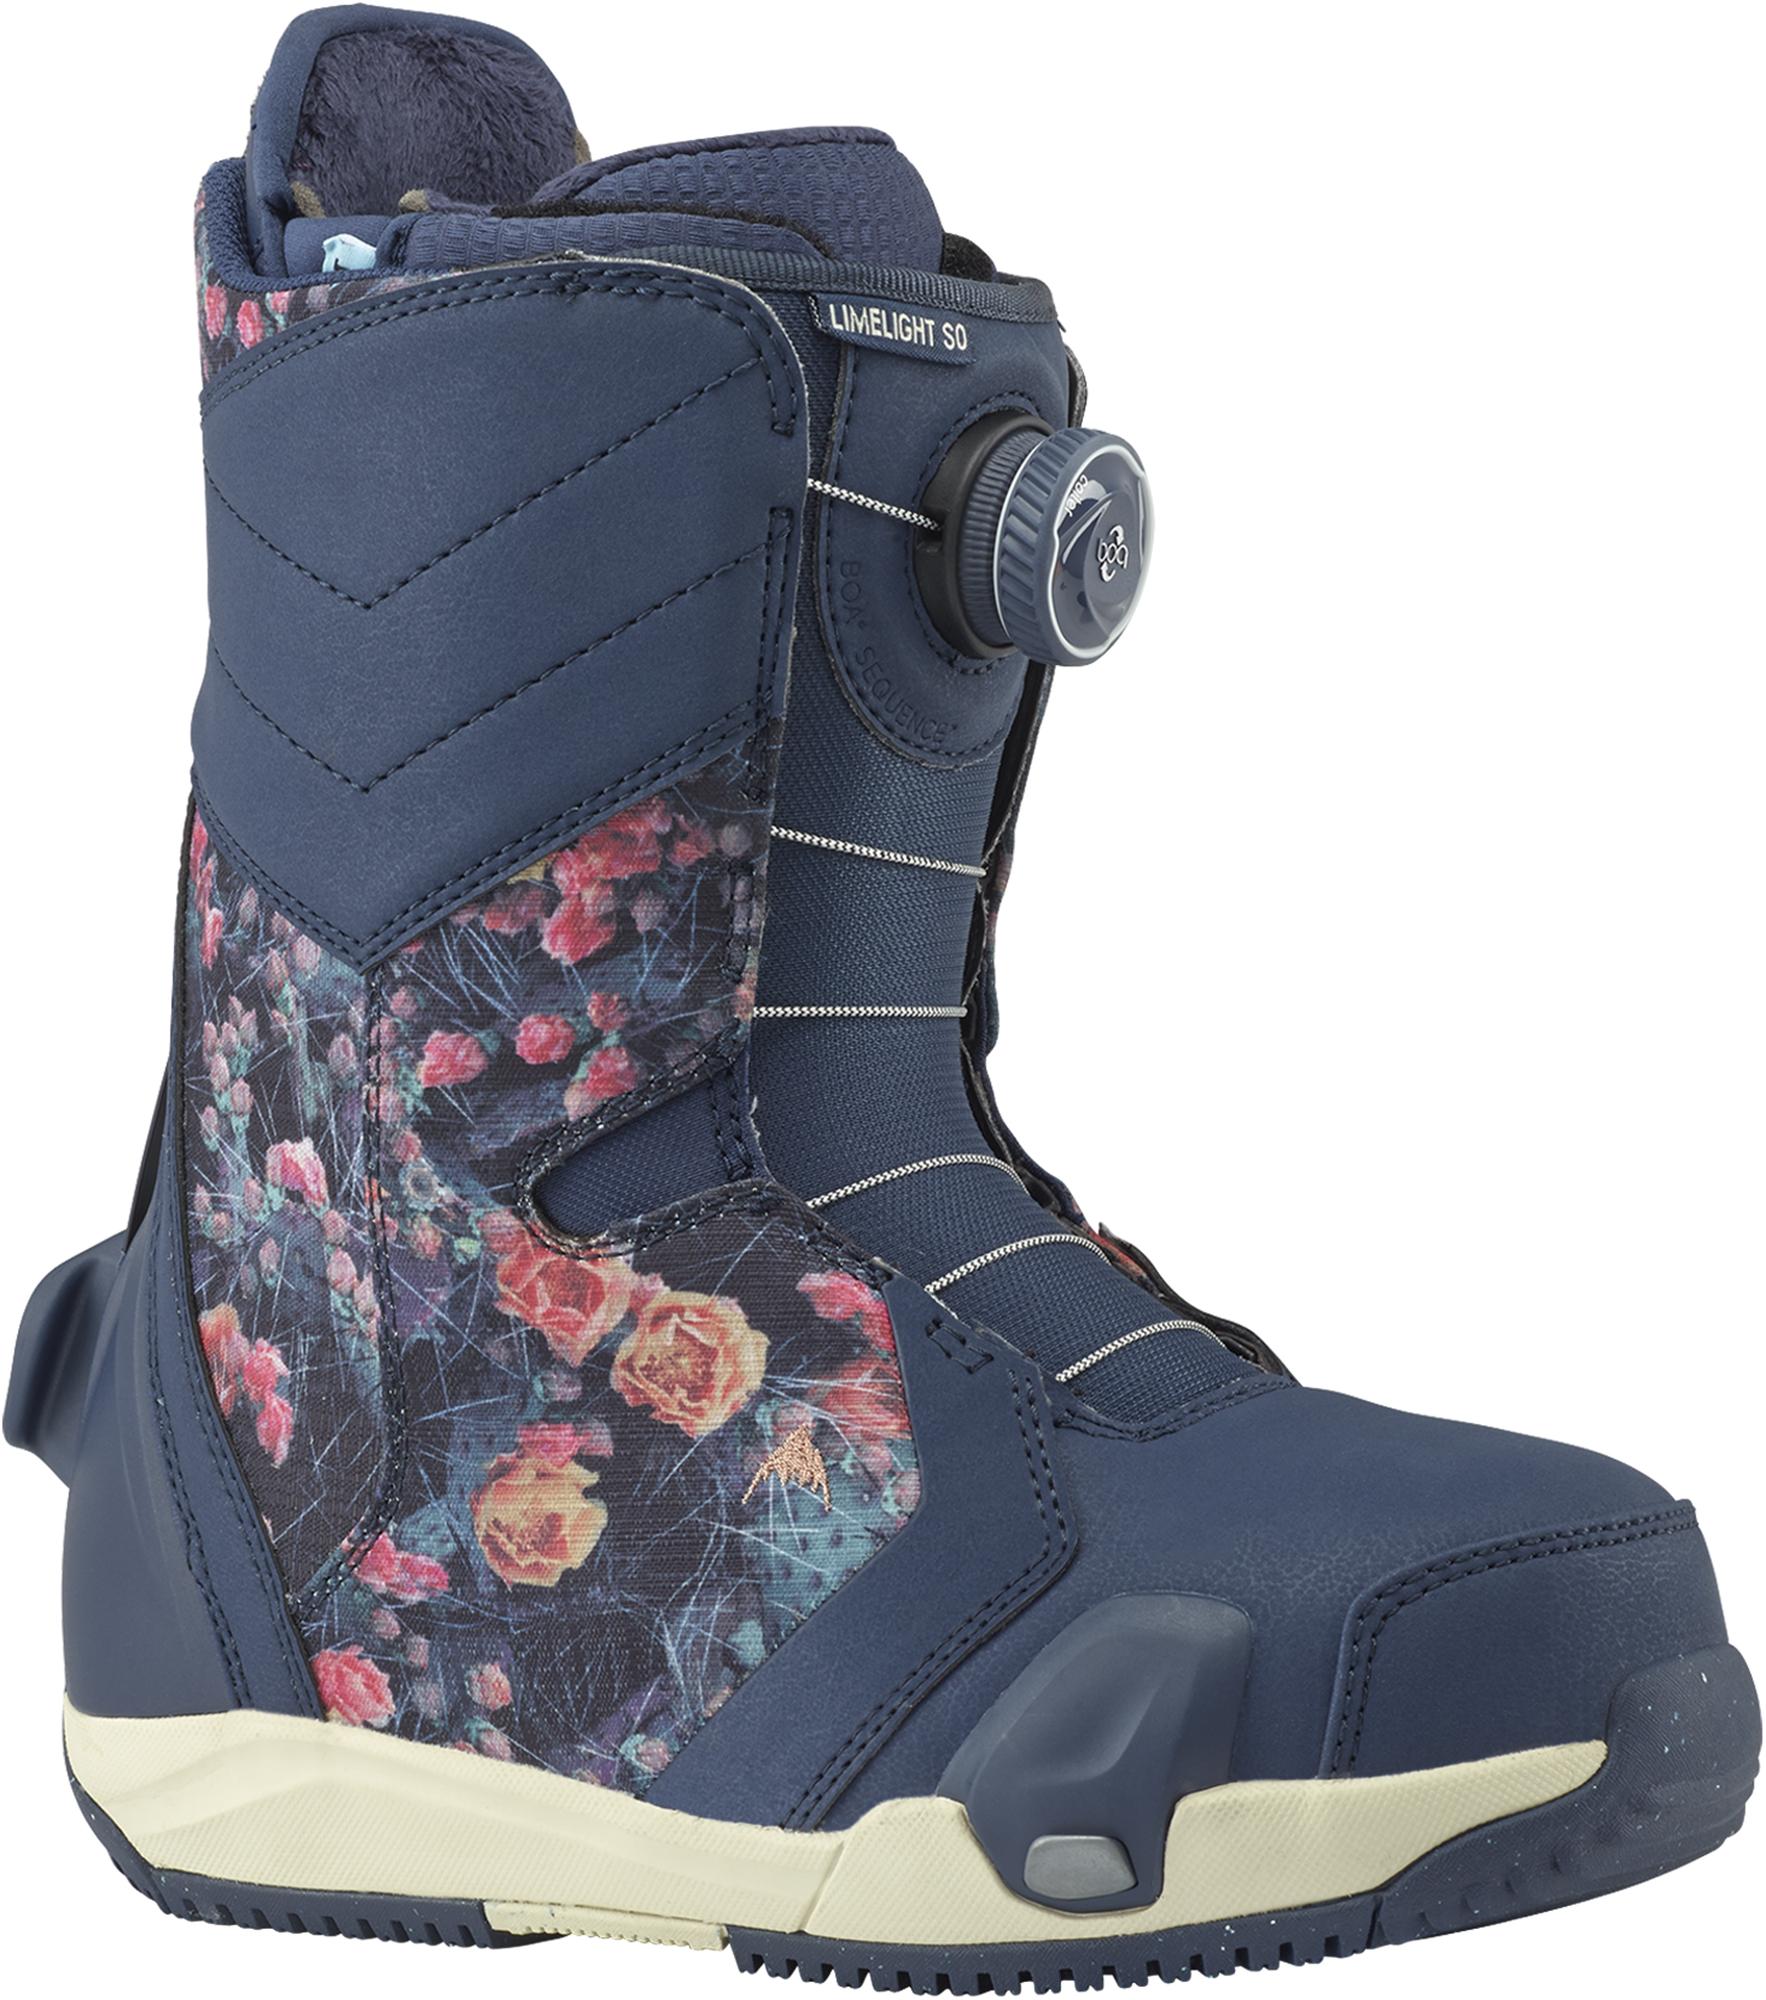 Burton Сноубордические ботинки женские Limelight Step On, размер 38